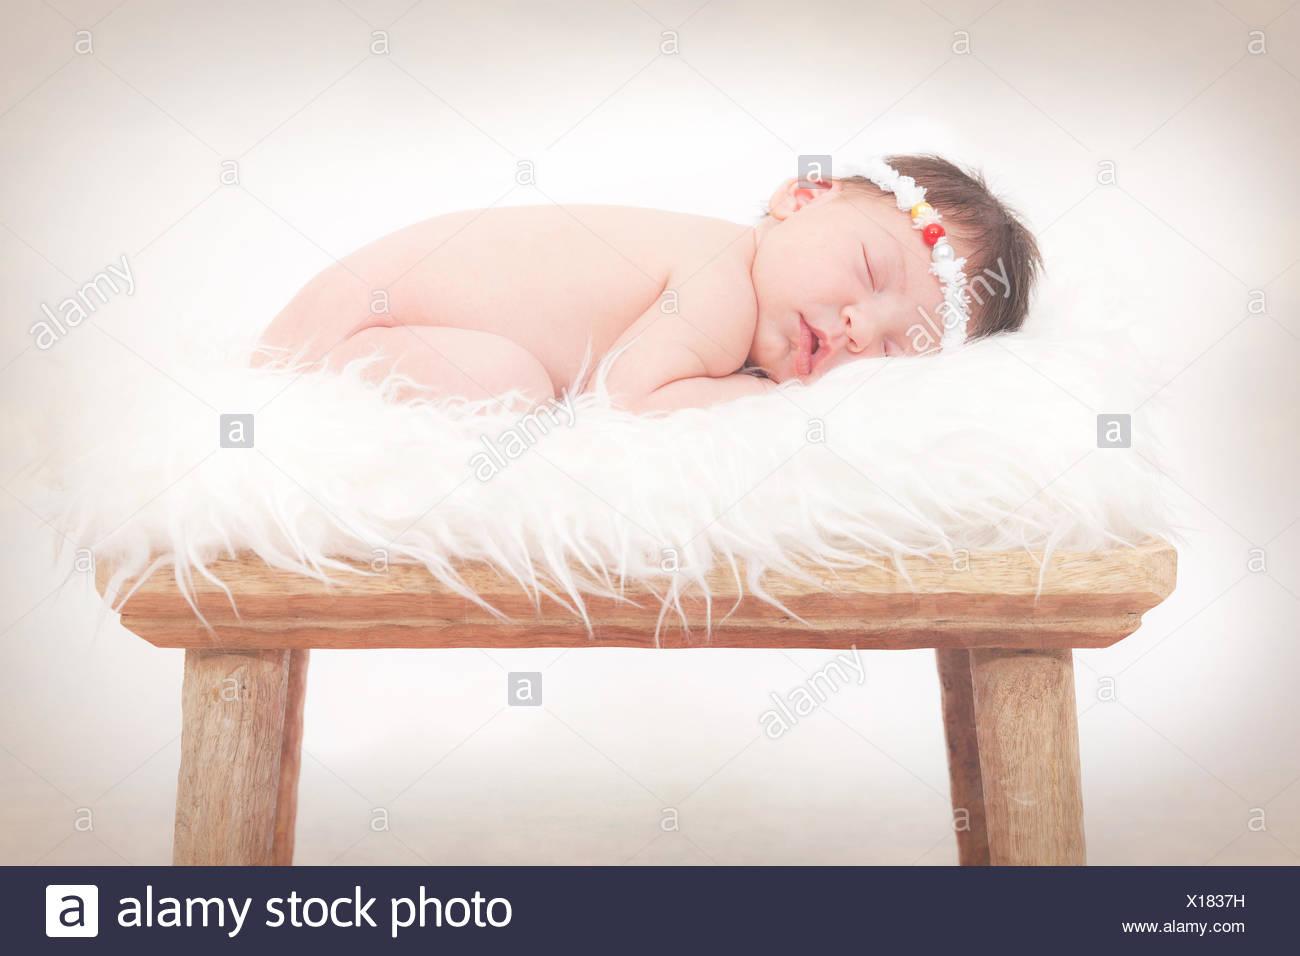 Portrait of a newborn baby girl sleeping on fluffy rug - Stock Image